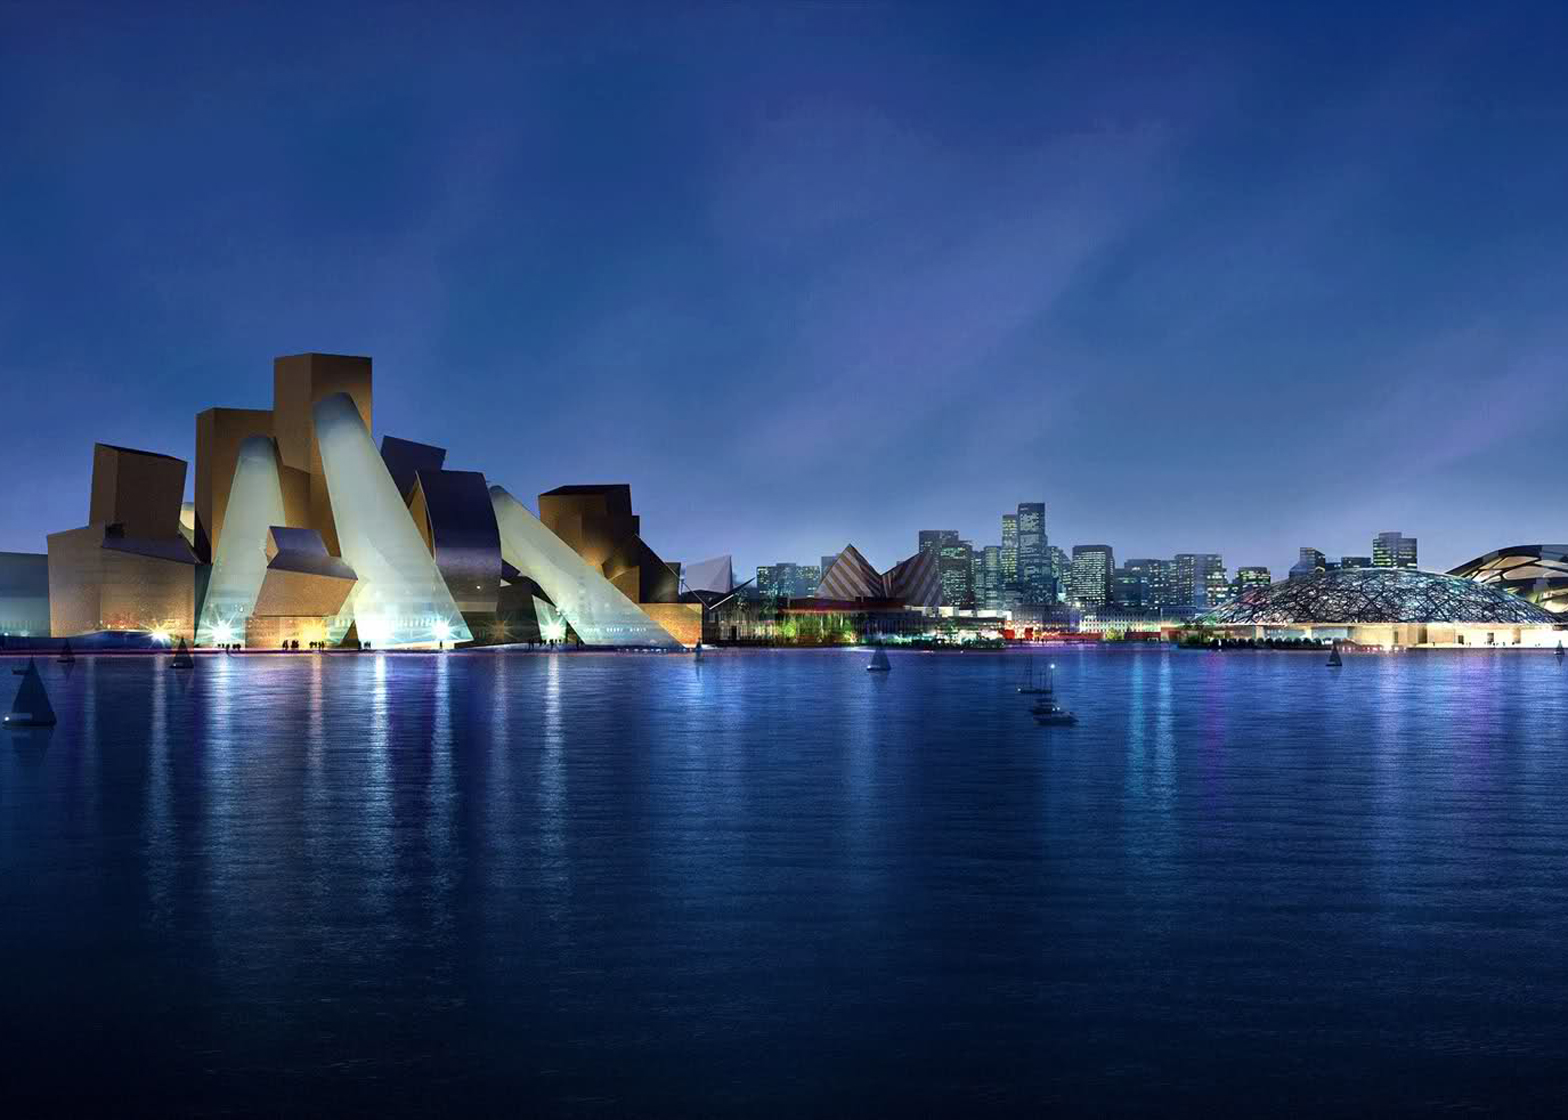 Guggenheim Abu Dhabi Museum Project - Saadiyat Island Development